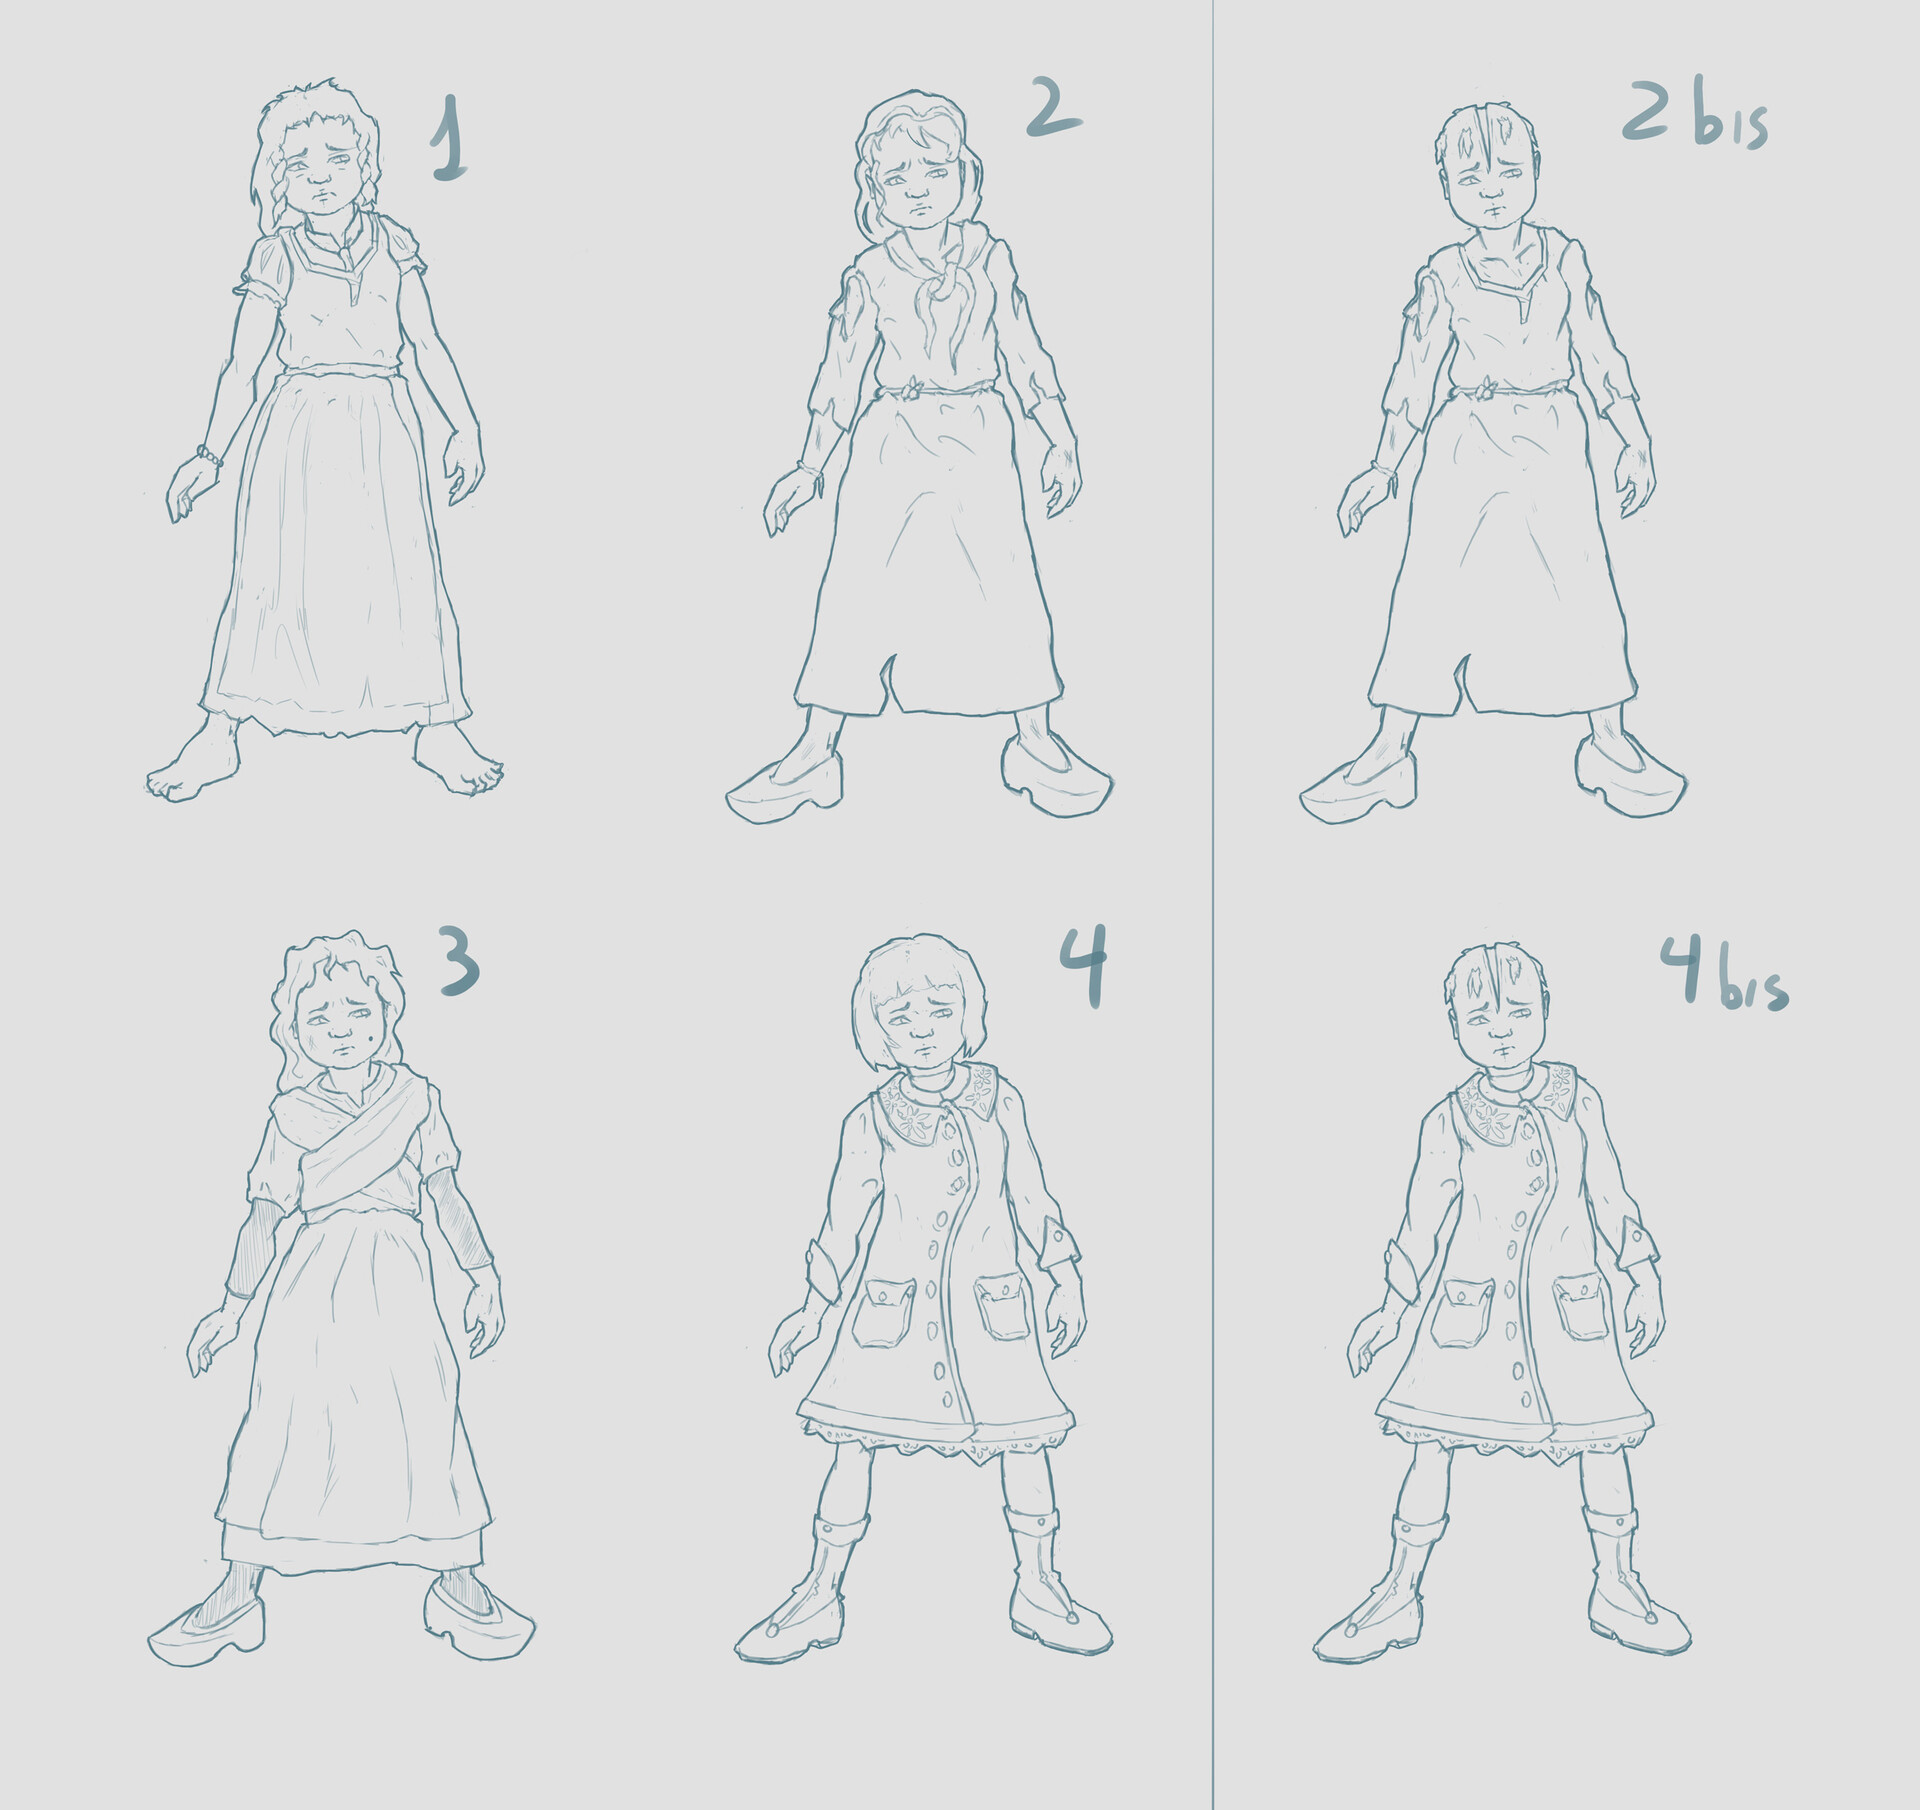 Girl Sketeches